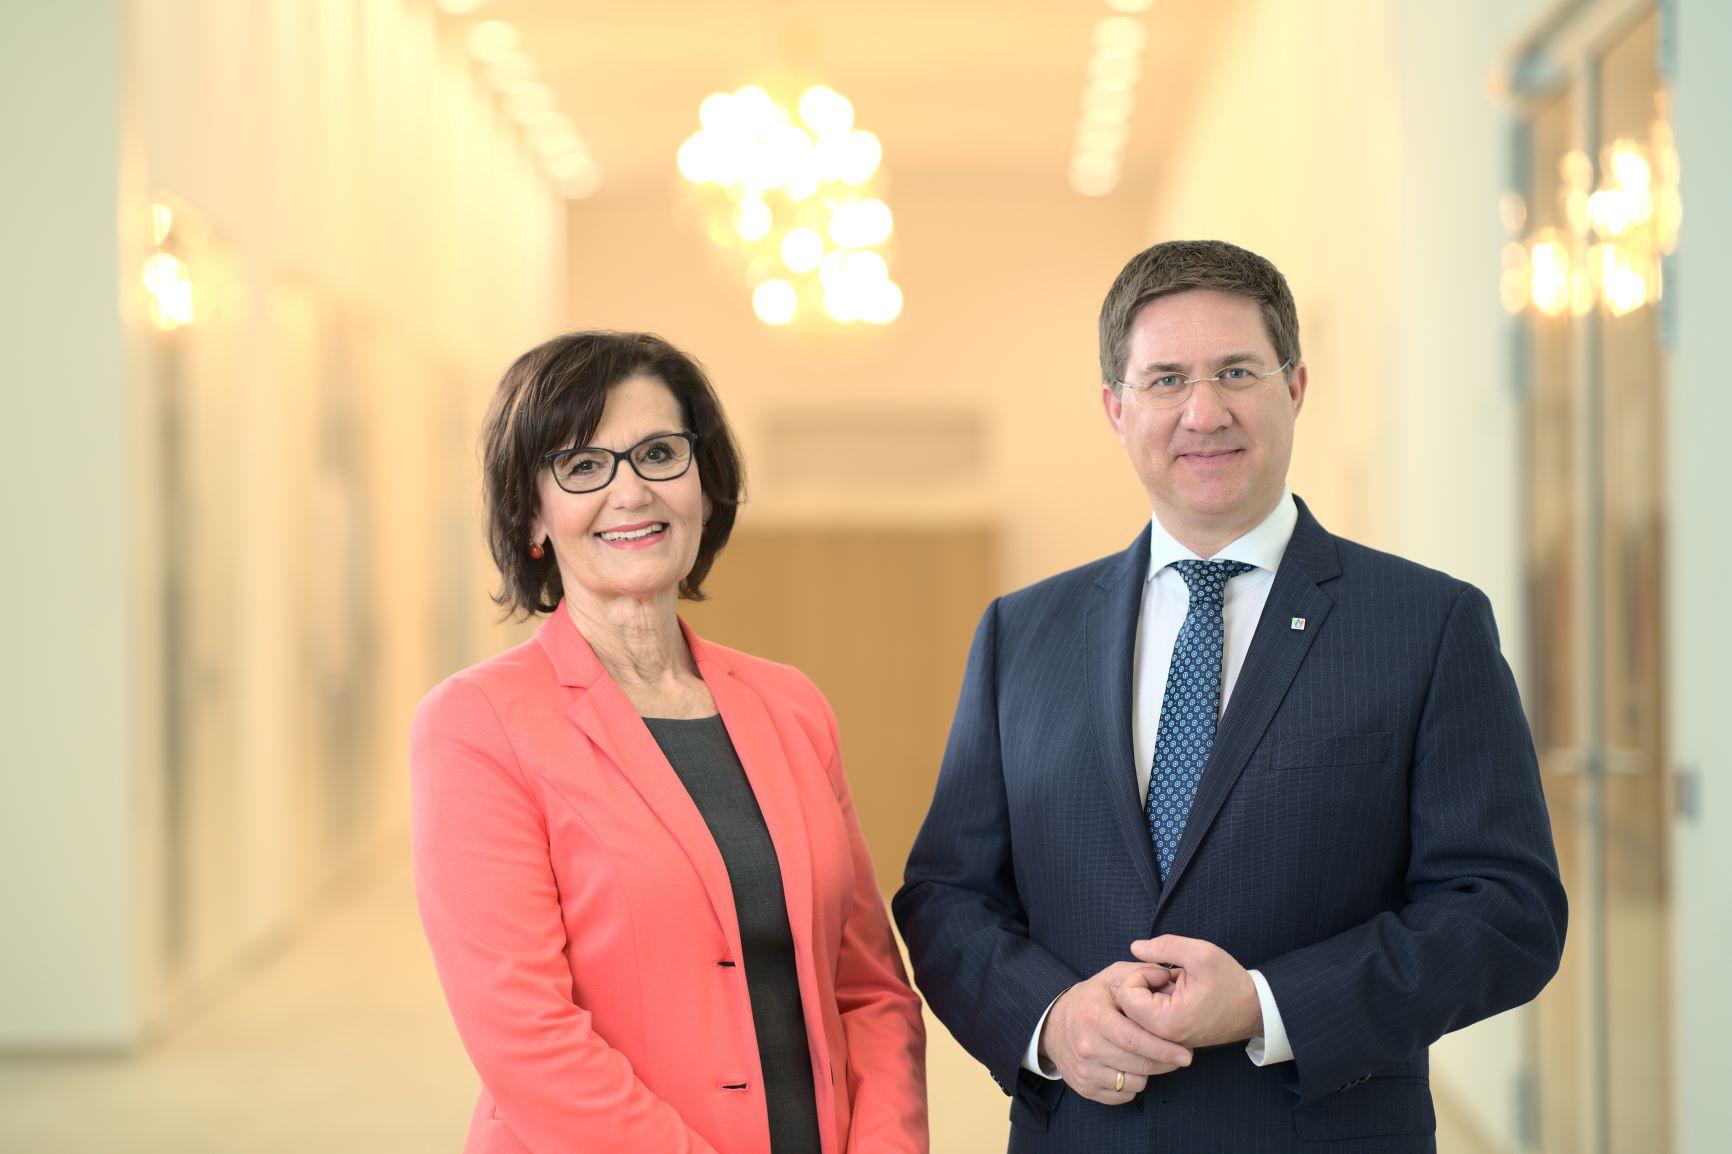 Bürgermeister Dr. Andreas Rabl mit Generationen-Stadträtin Margarete Josseck-Herdt